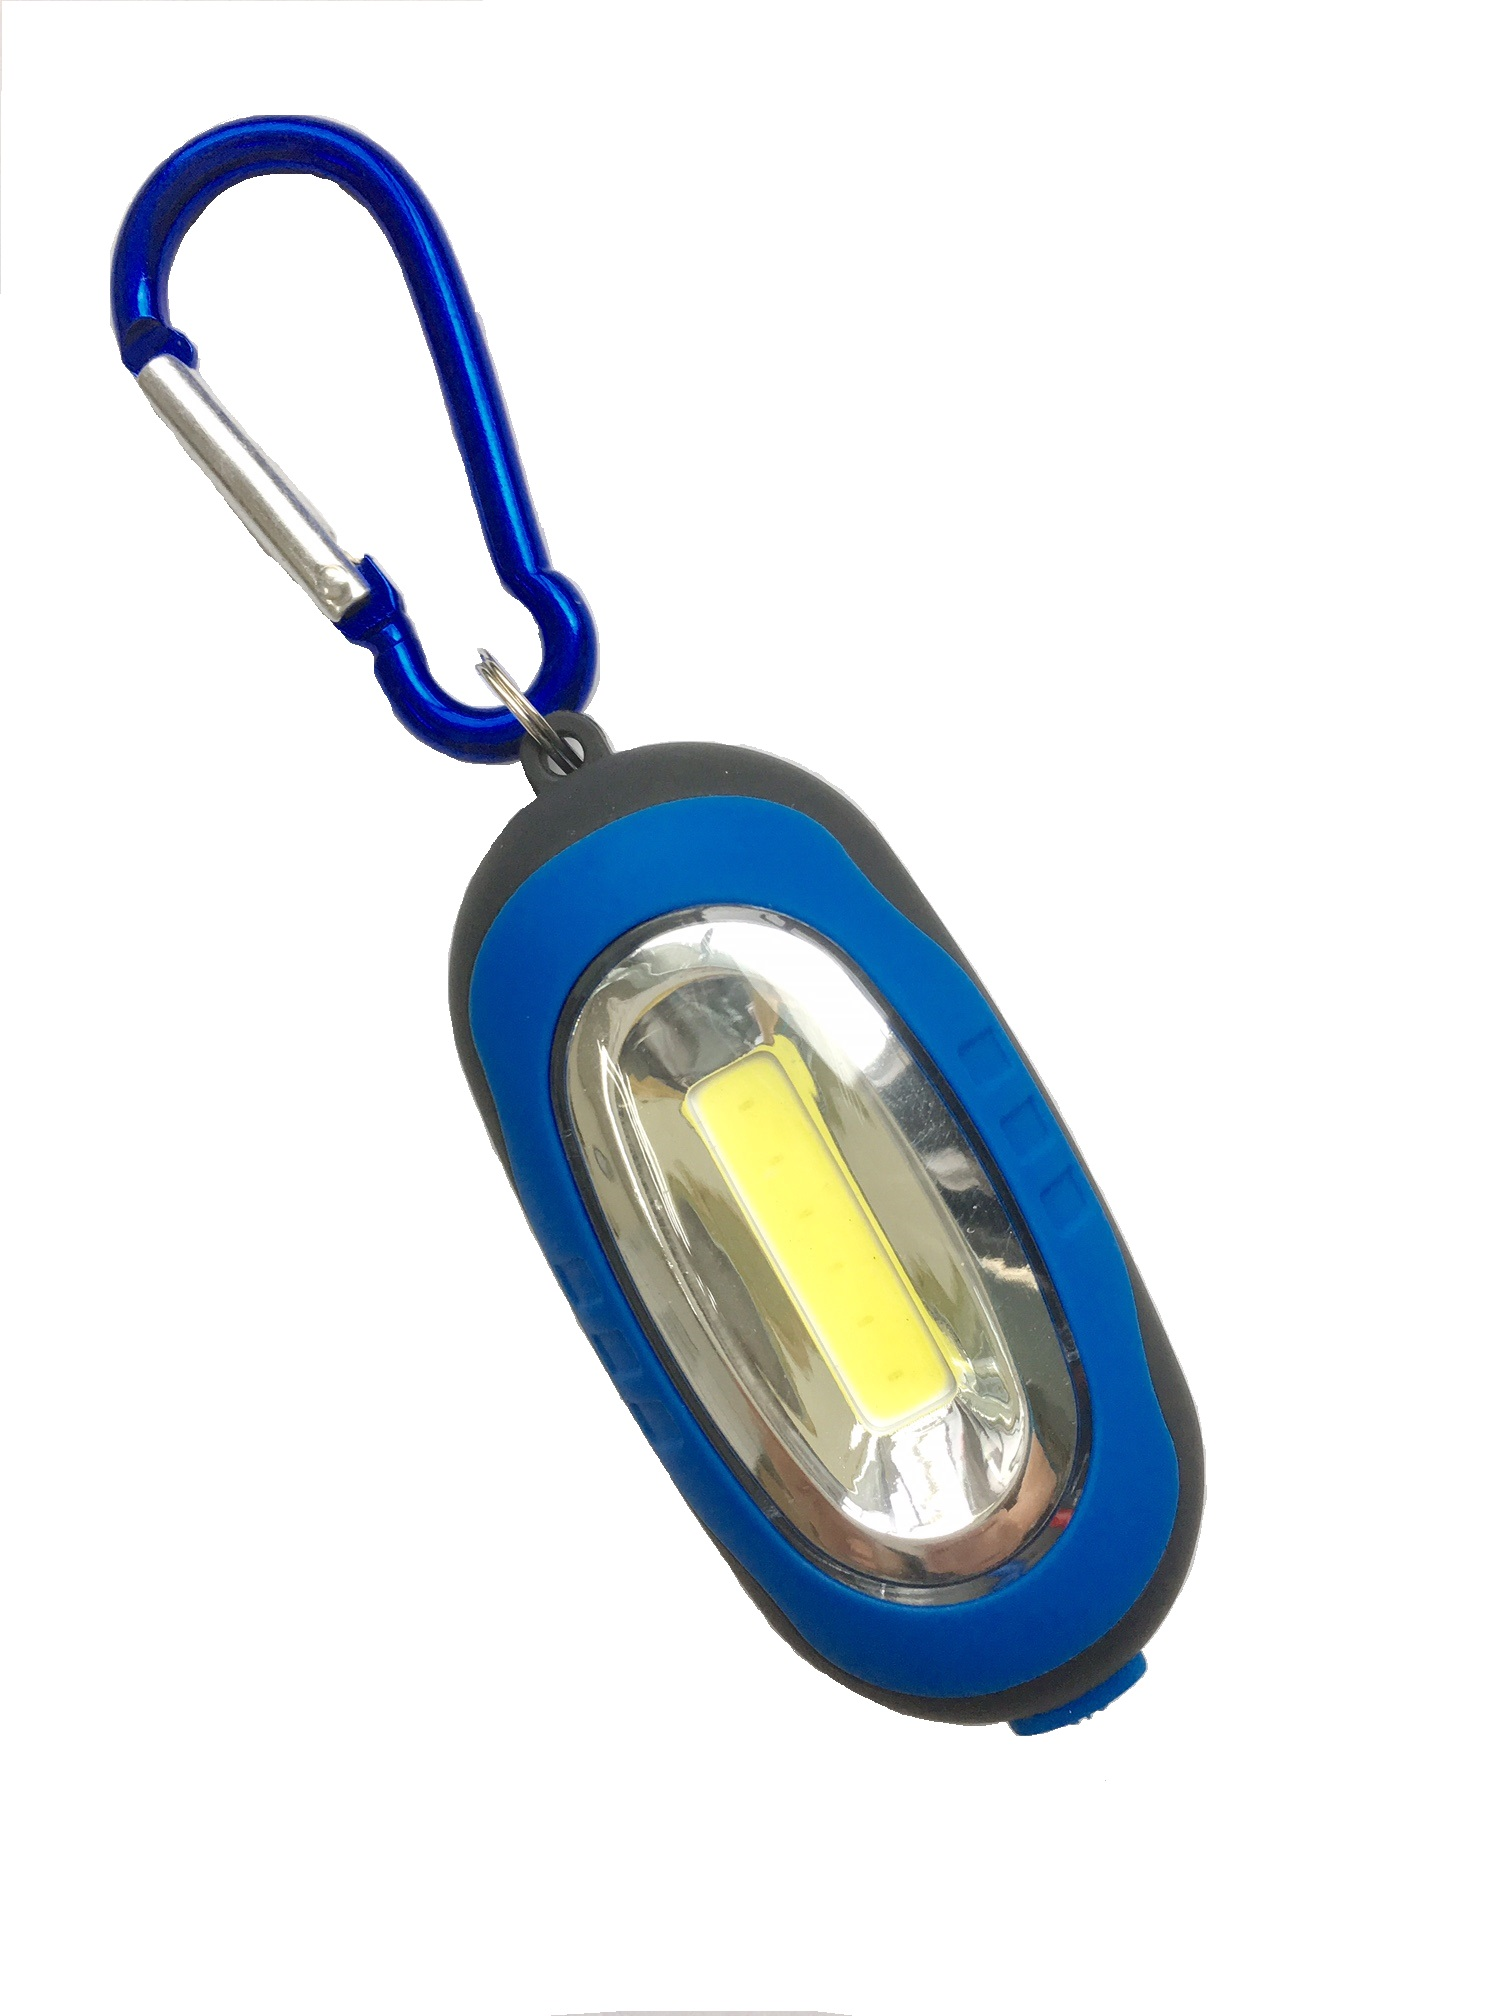 COB型 LEDライト カラビナ付ミニライト マグネット付